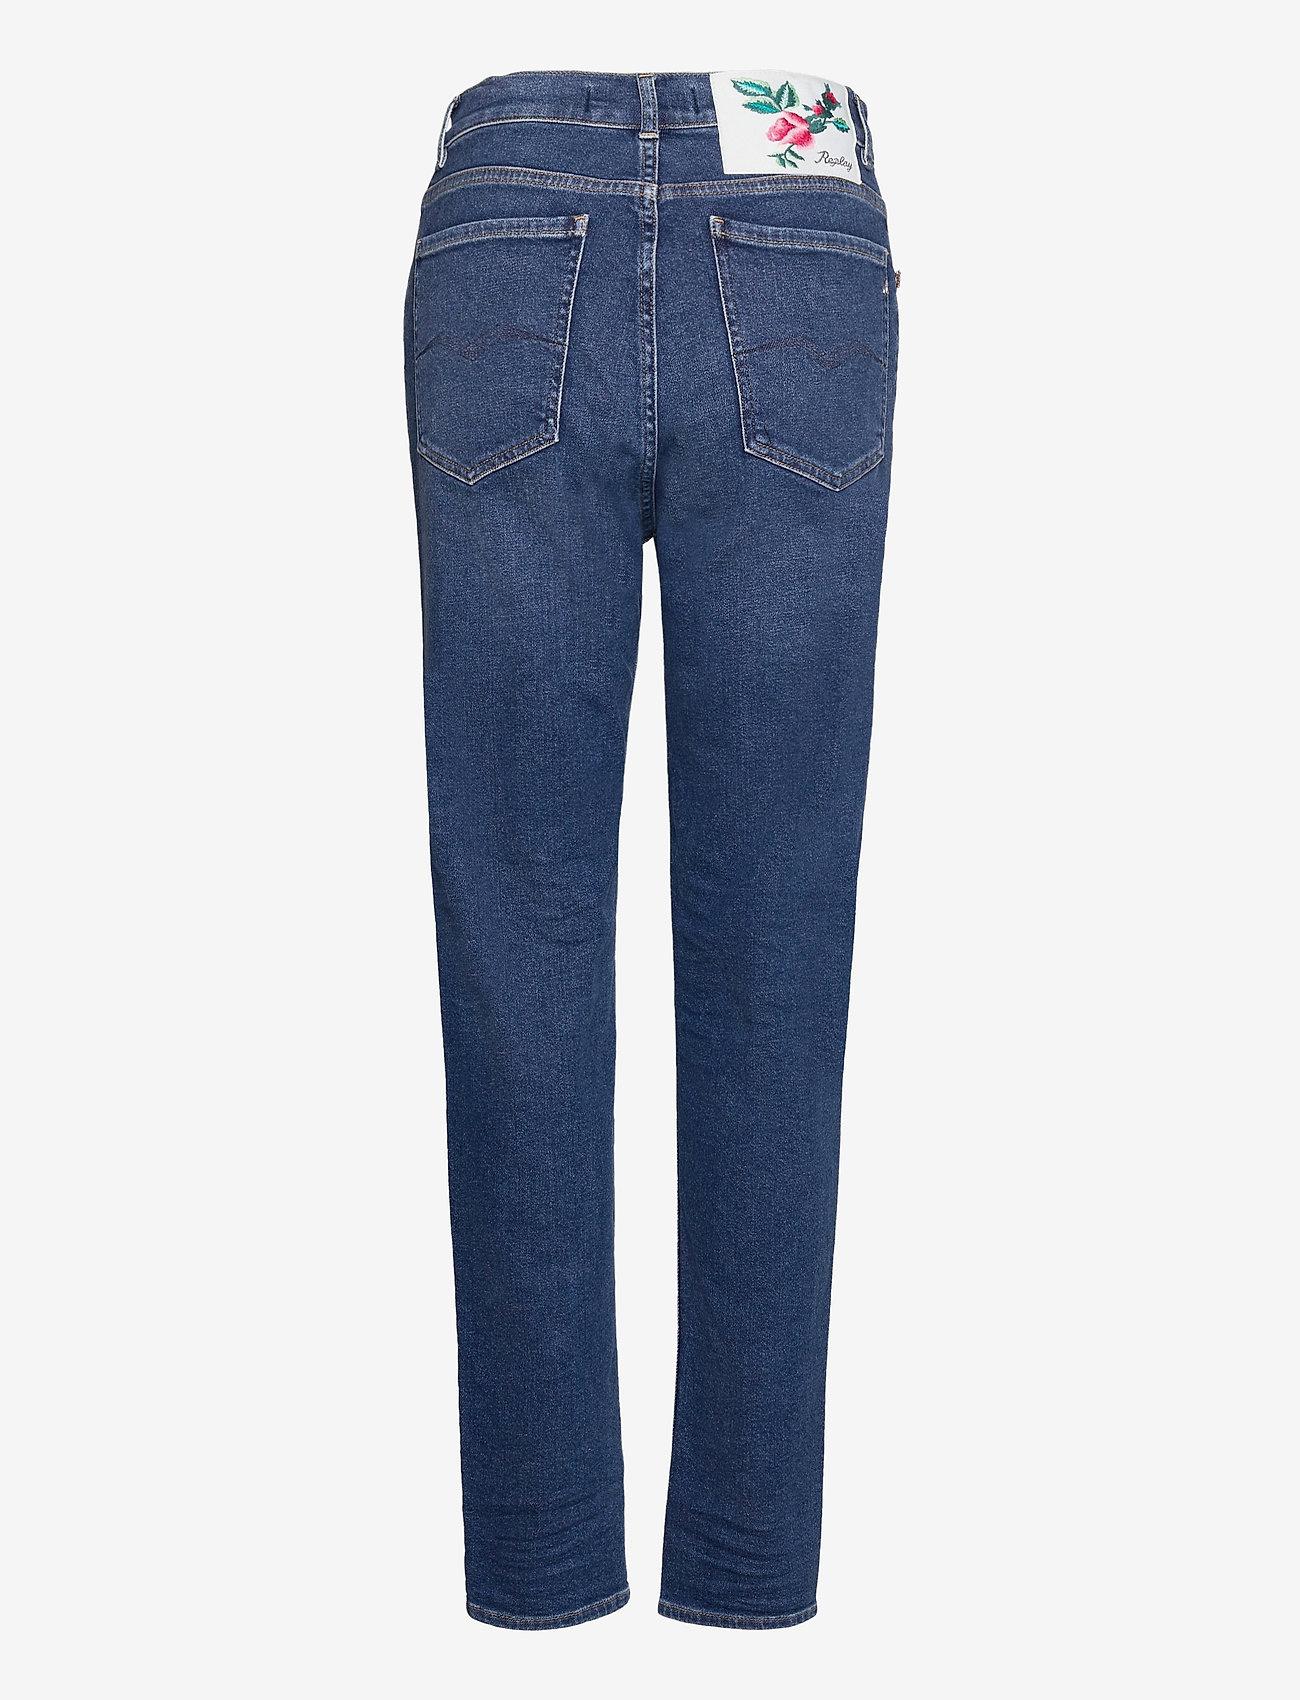 Replay - KILEY Rose Label Pack - slim jeans - medium blue - 1